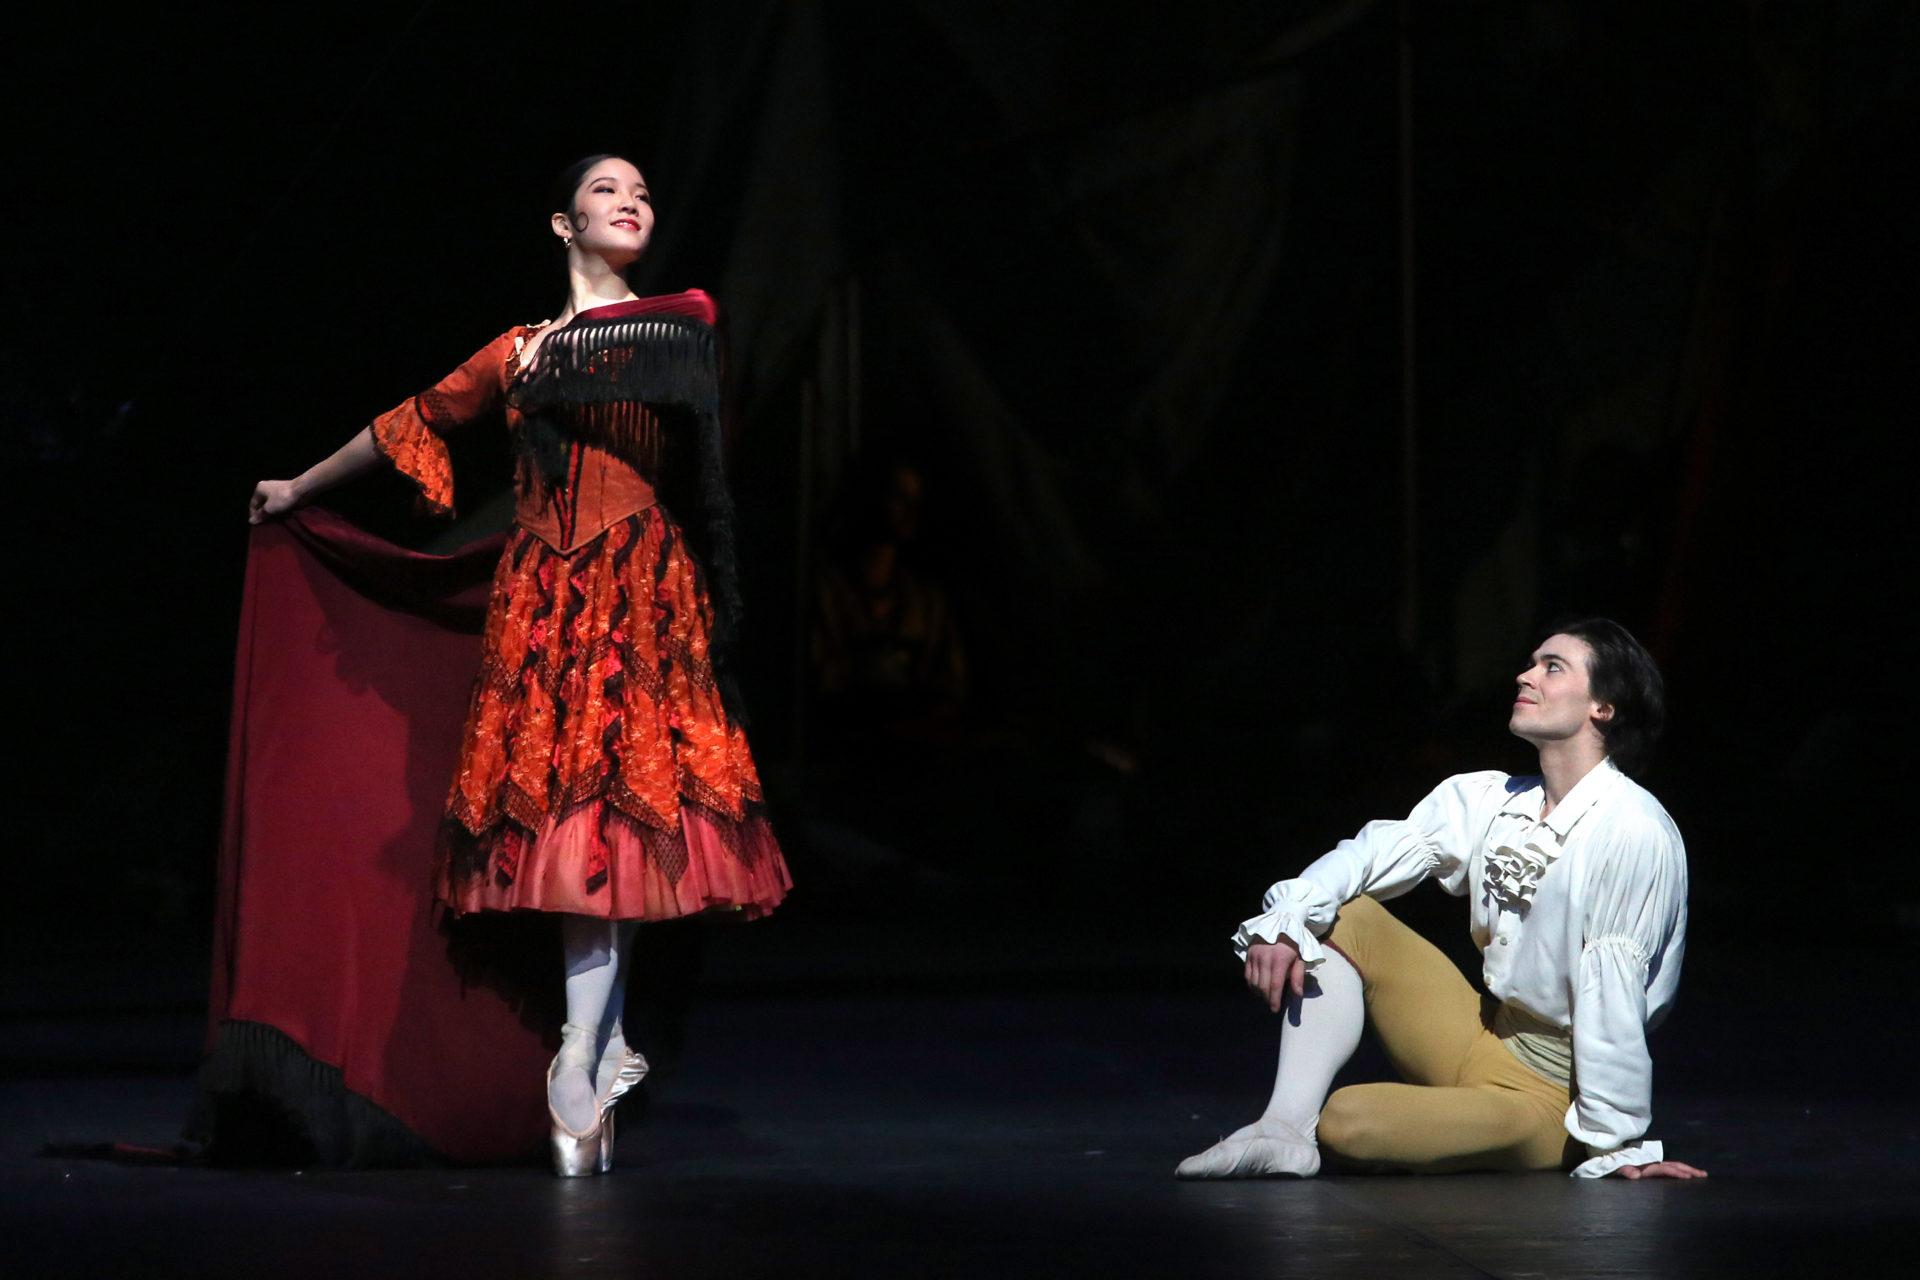 Don_Quixote_HH_Ballett_Foto_AnjaBeutler.de_266